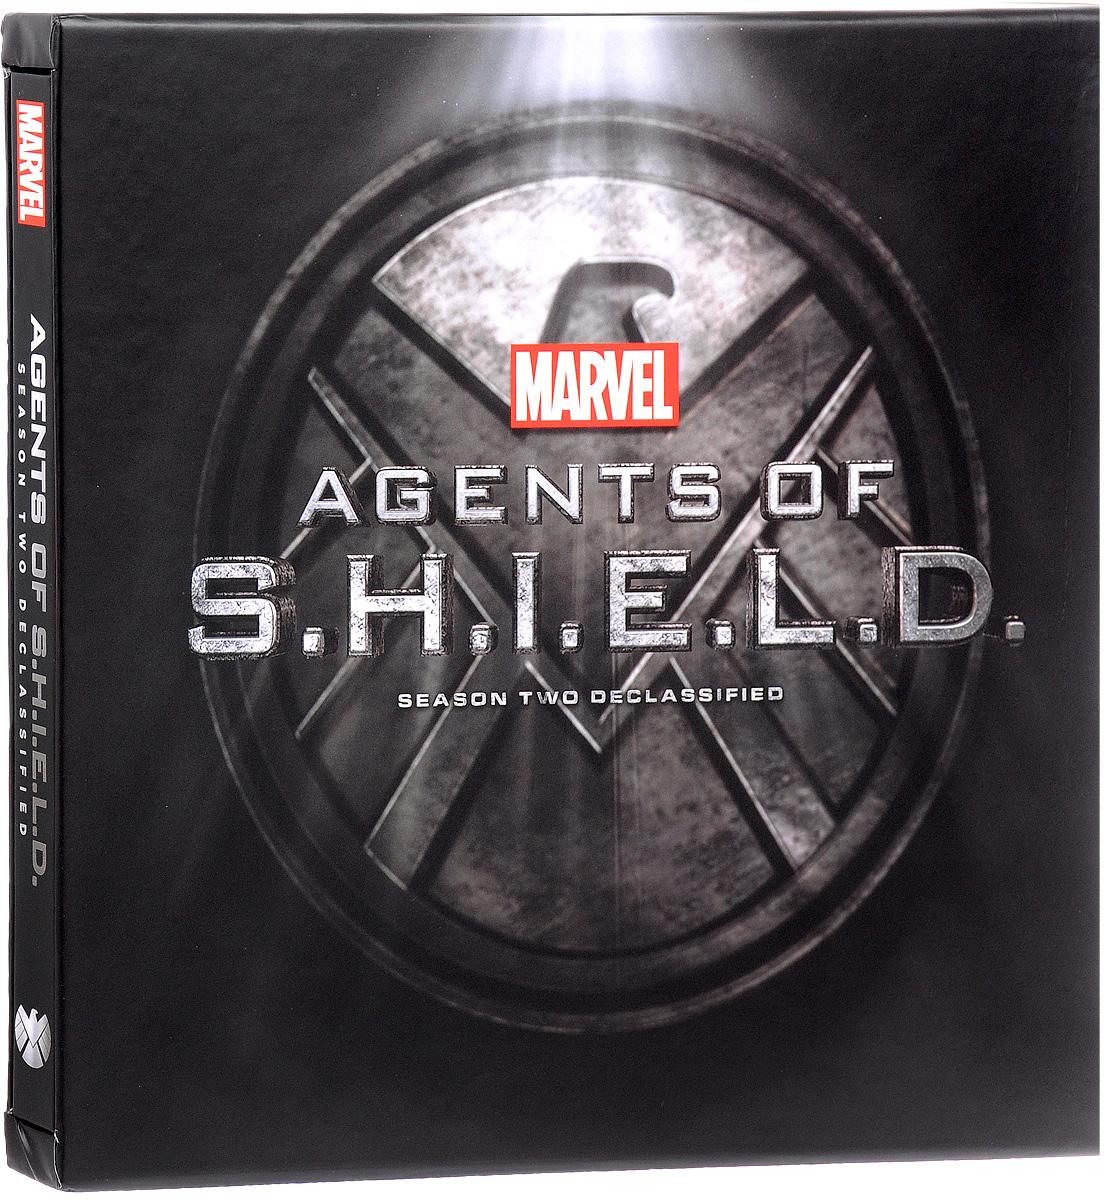 Marvel's Agents of S.H.I.E.L.D.: Season two Declassified пена монтажная mastertex all season 750 pro всесезонная